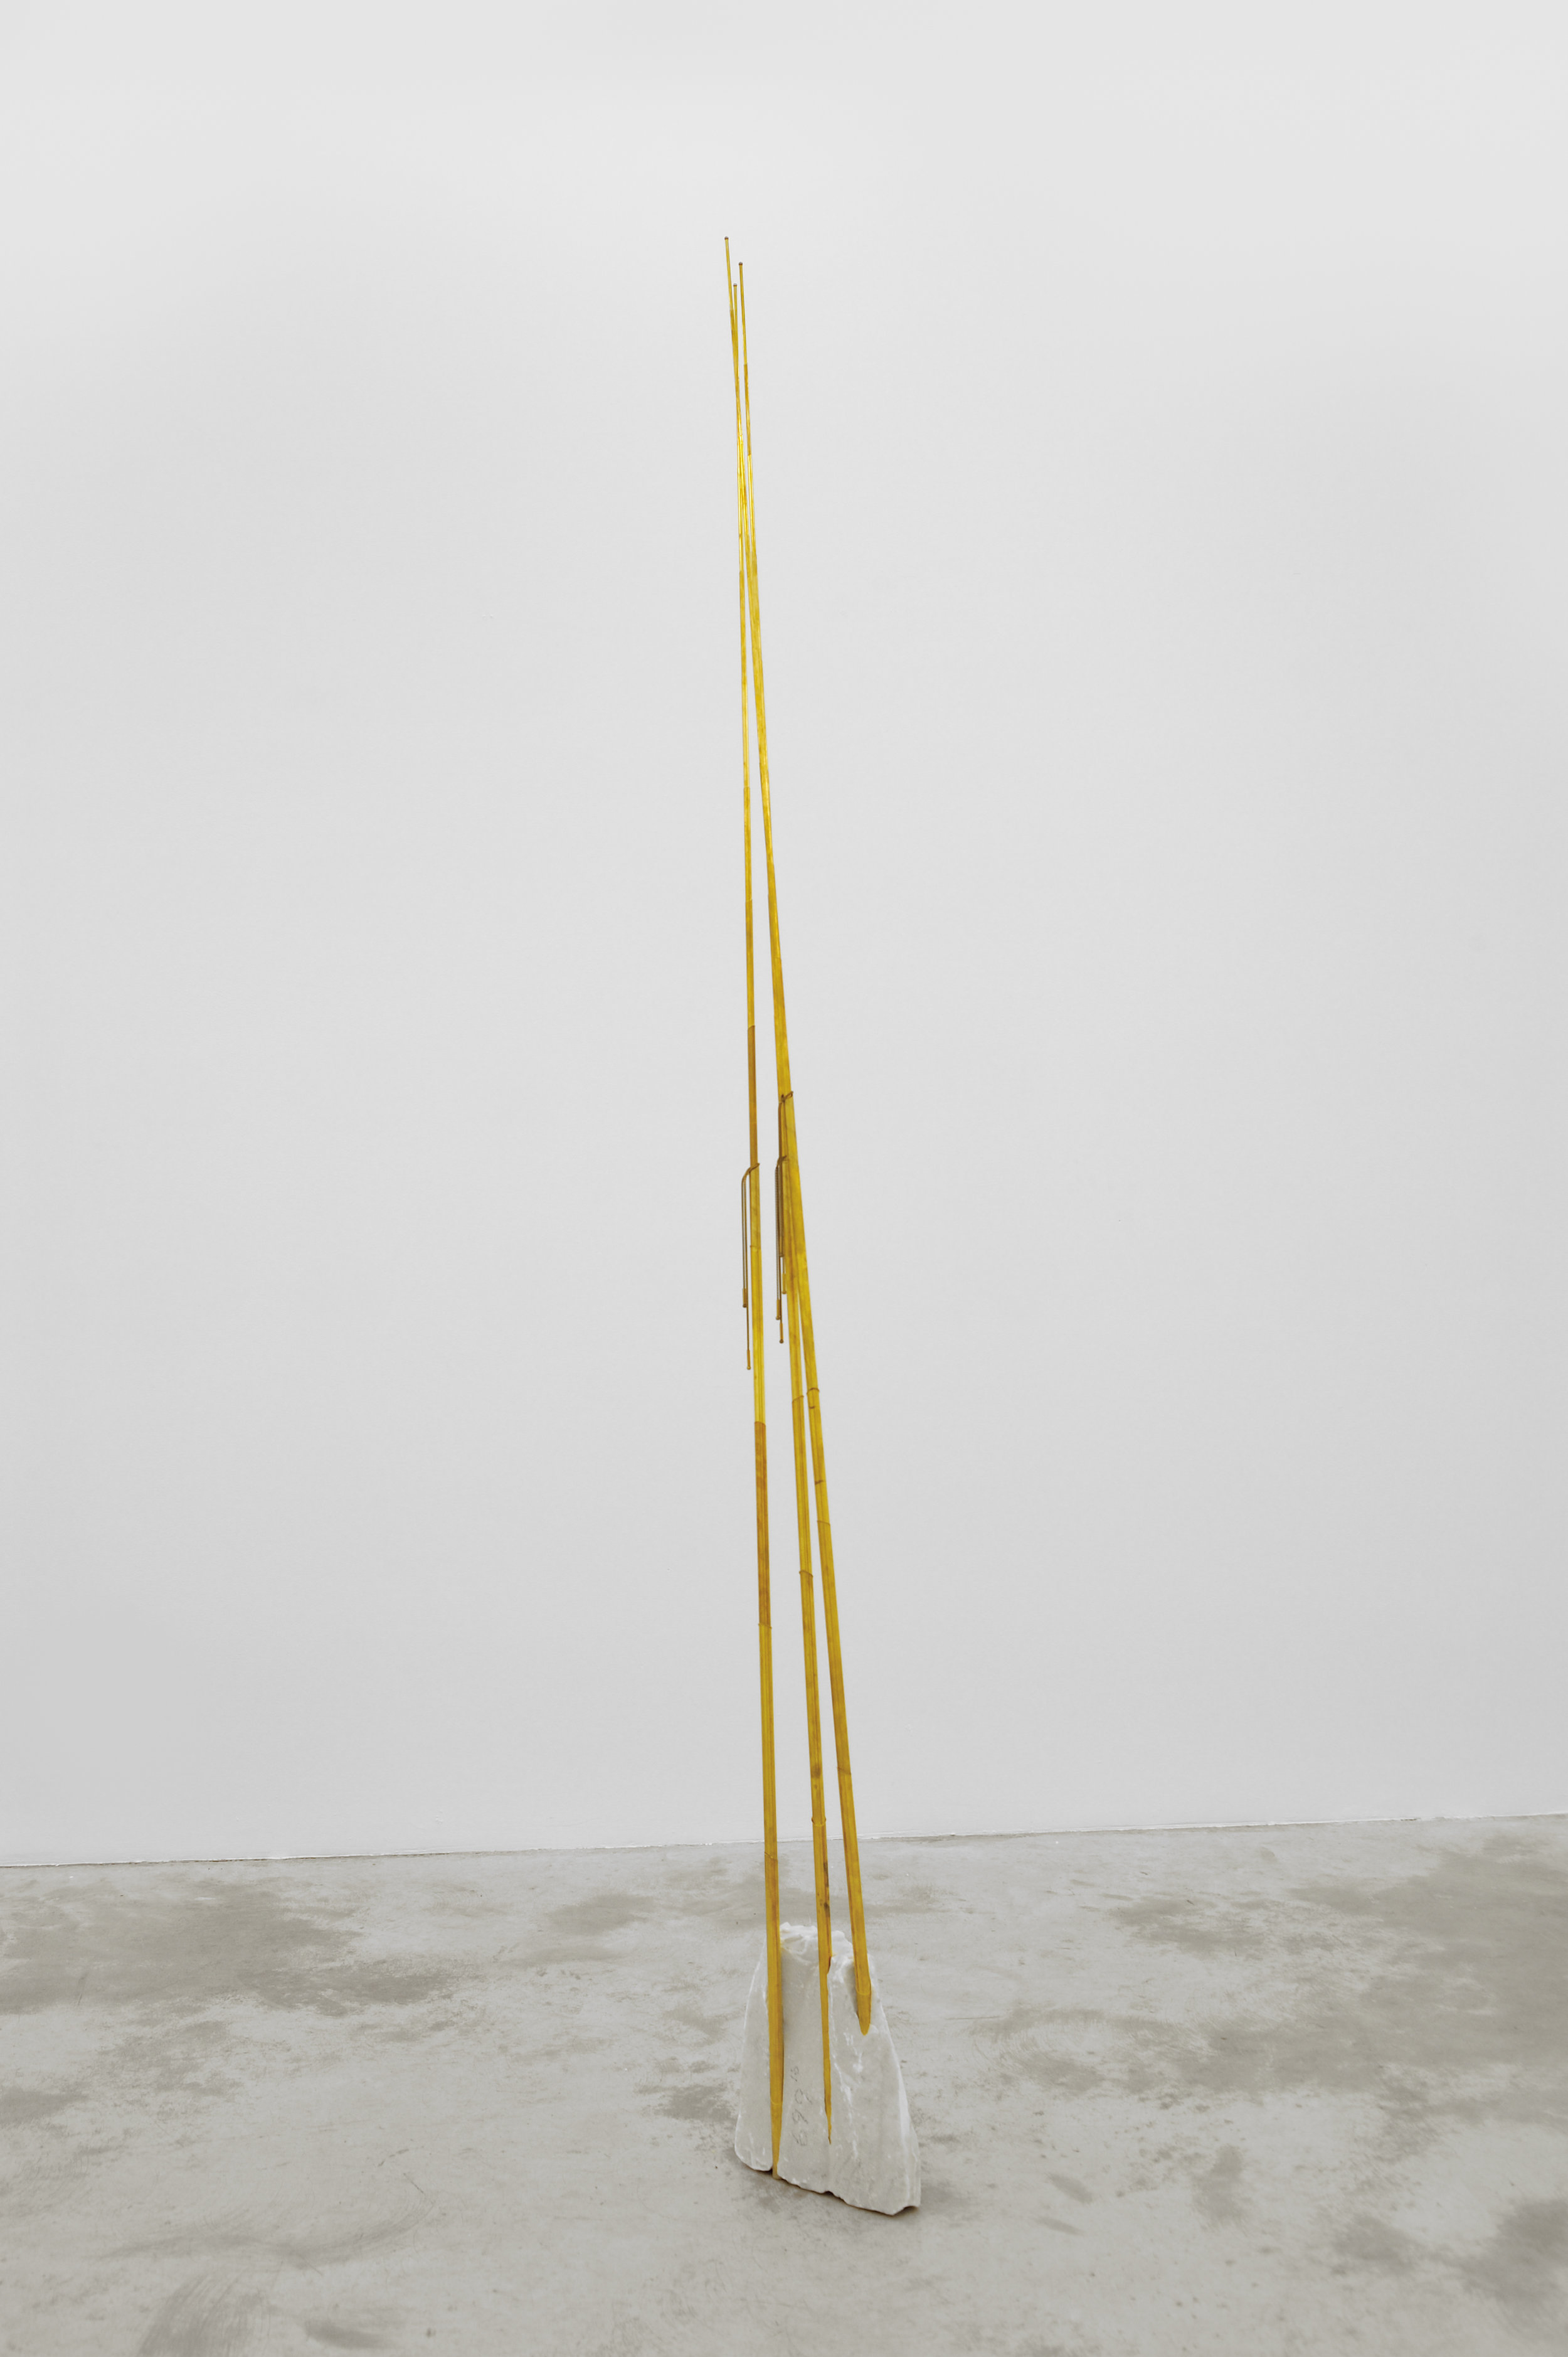 Elaine Cameron-Weir, Egyptian Technologies, 2013 brass, marble 274 x 36 x 8 cm - 108 x 14 x 3 inches